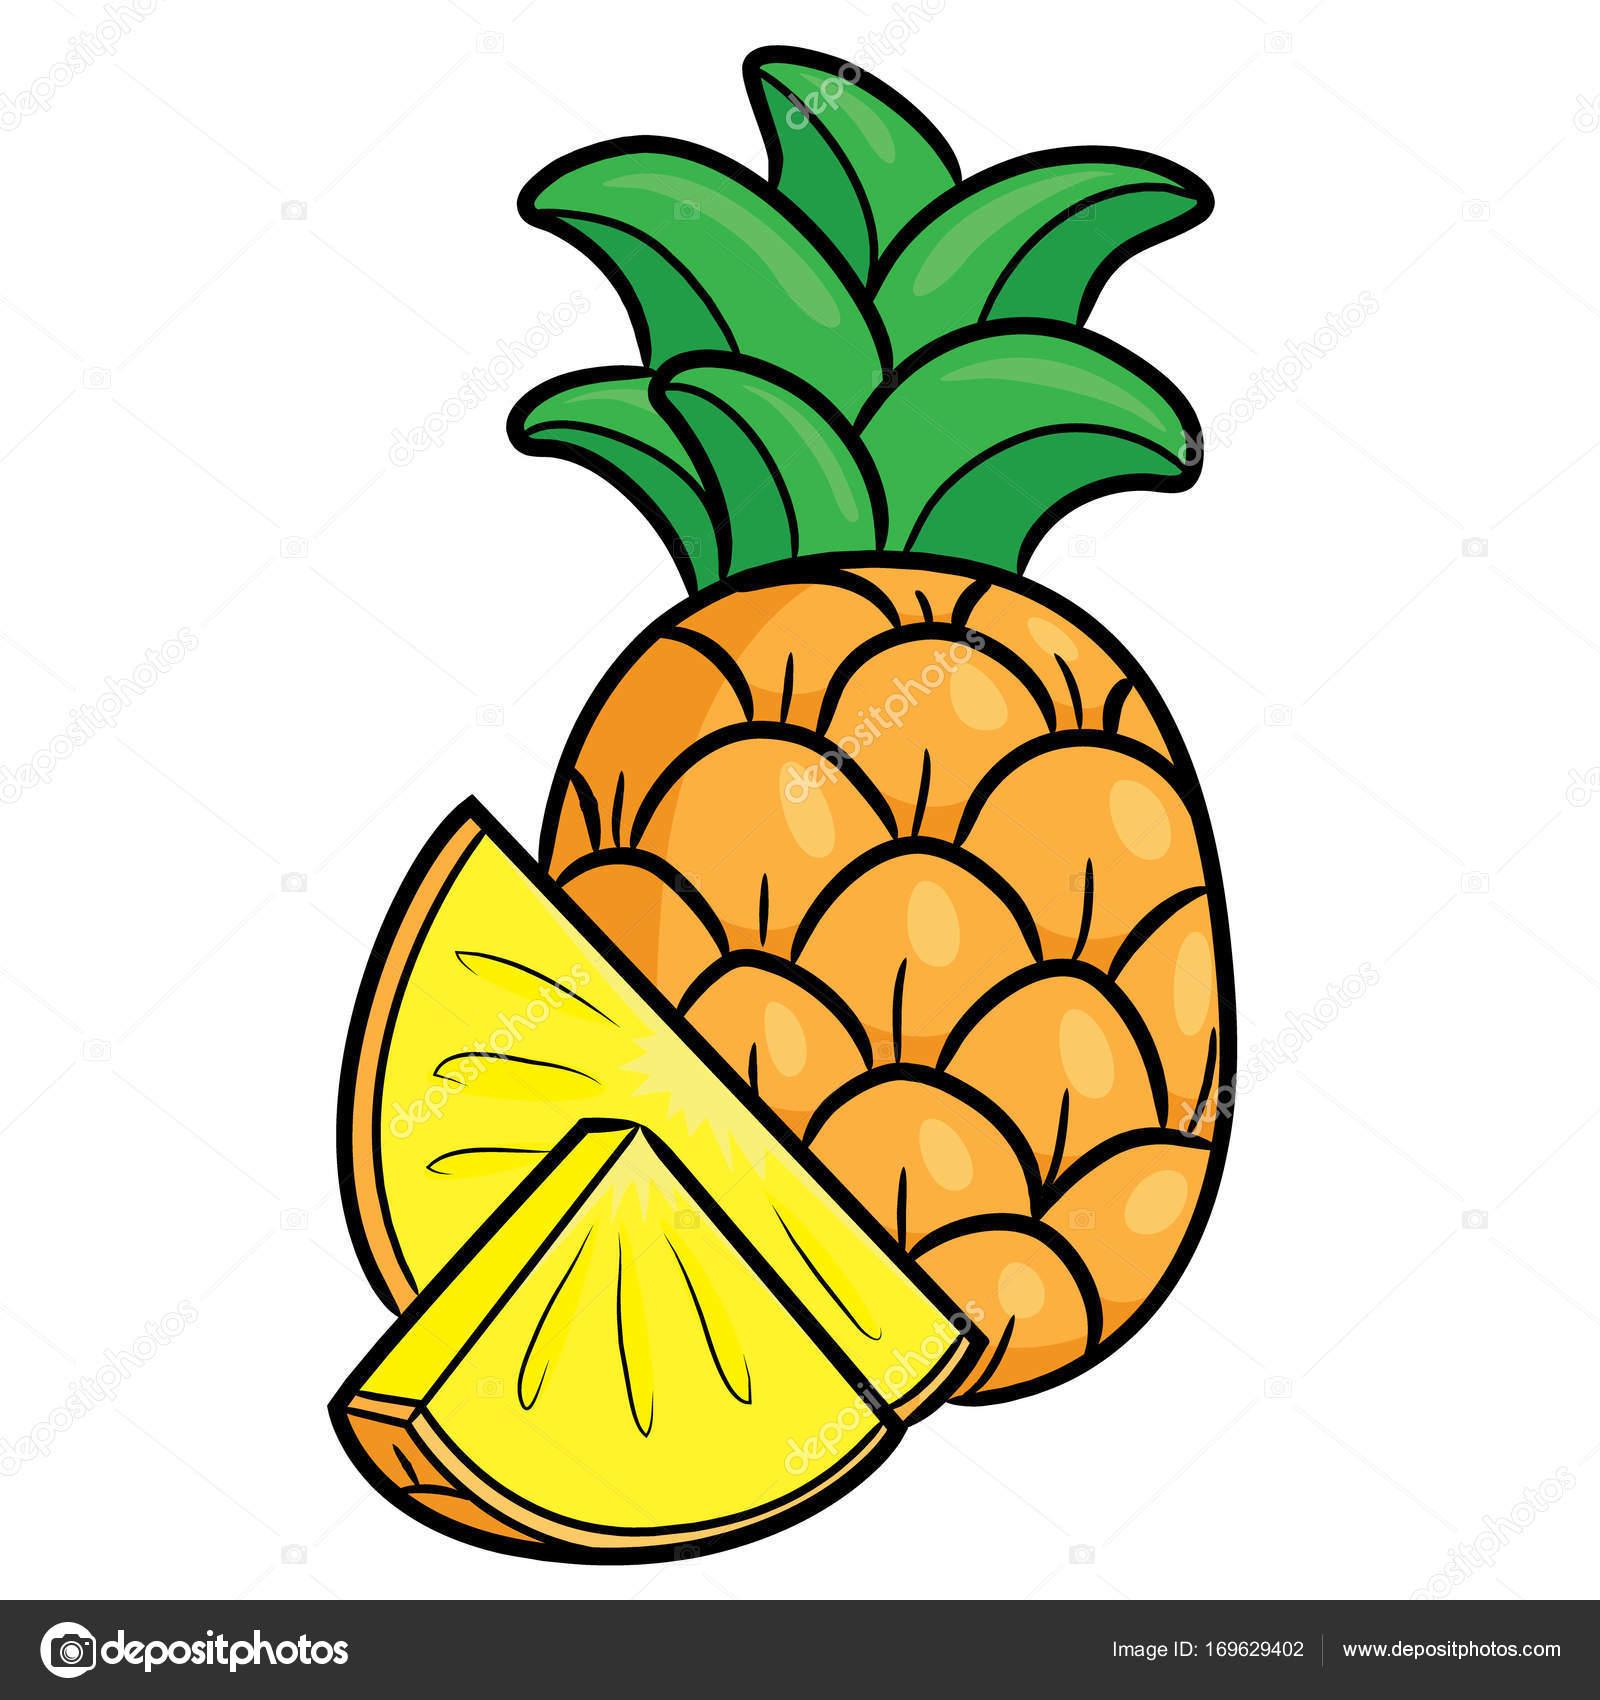 1600x1700 Pineapple Cute Cartoon Stock Vector Rubynurbaidi